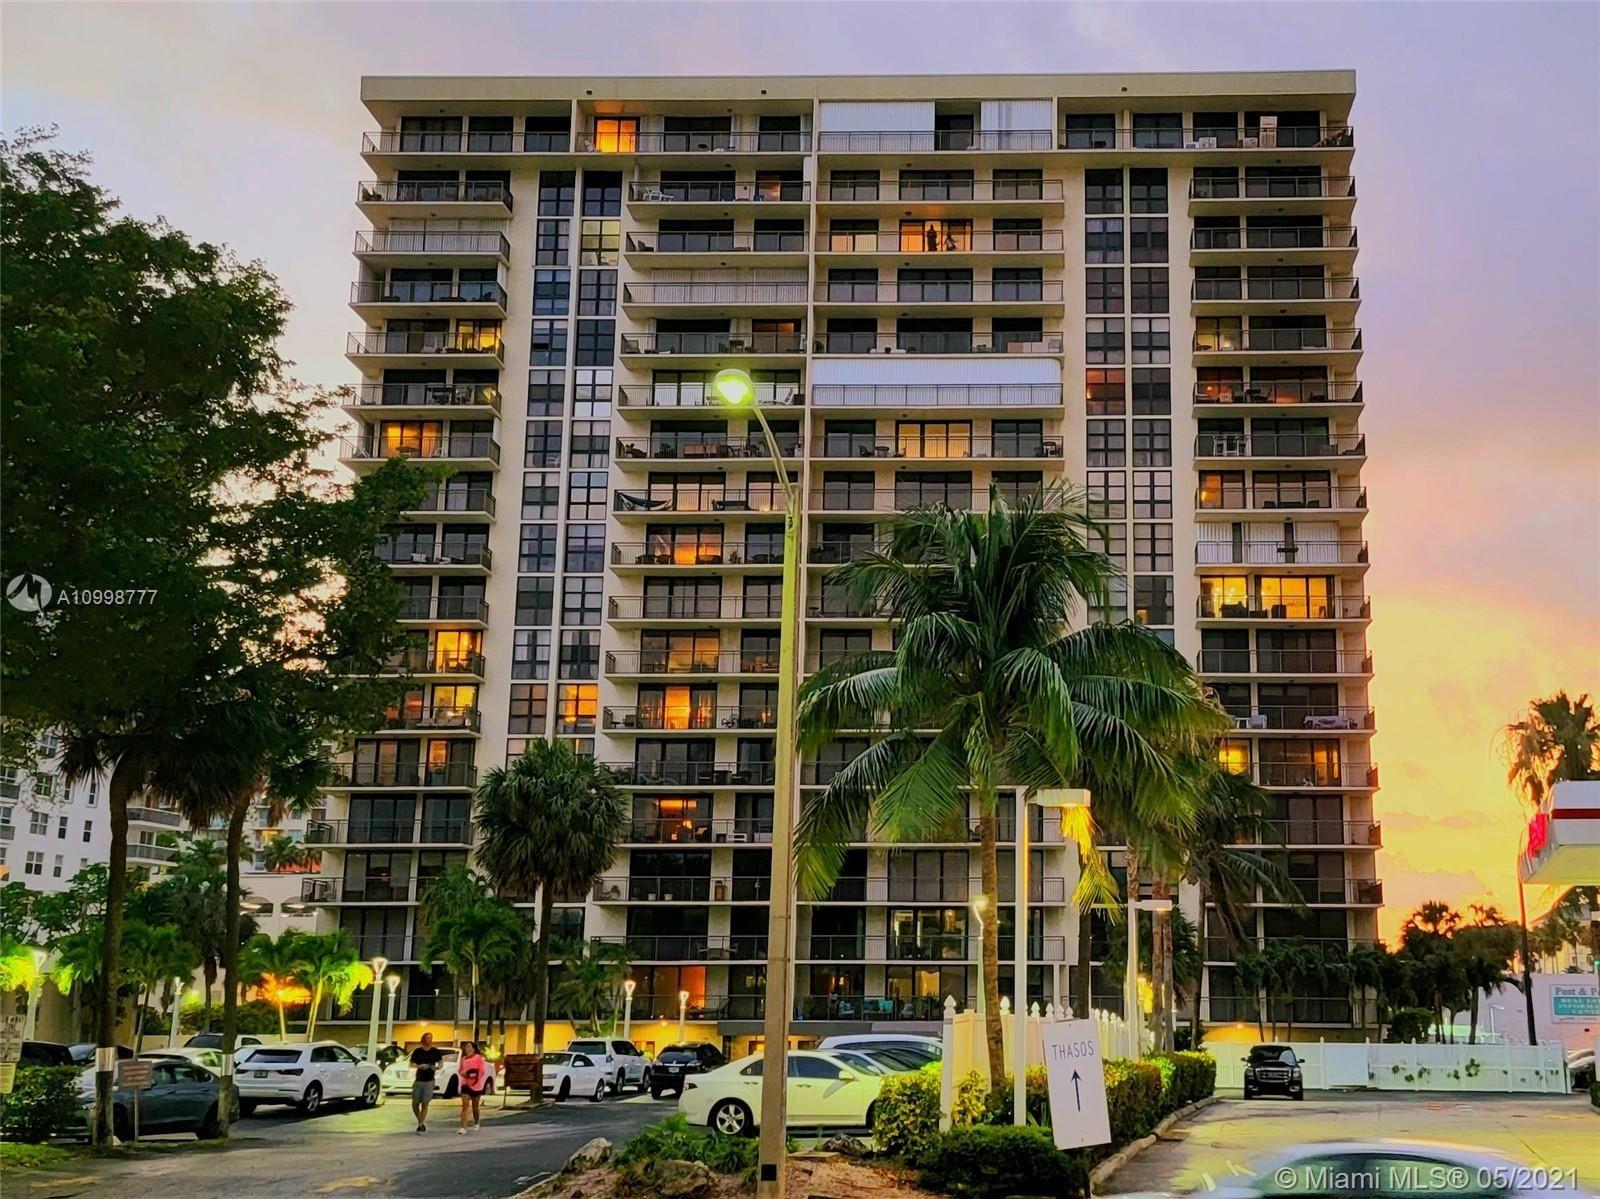 3031 N Ocean Blvd #1001, Fort Lauderdale, FL 33308 - #: A10998777